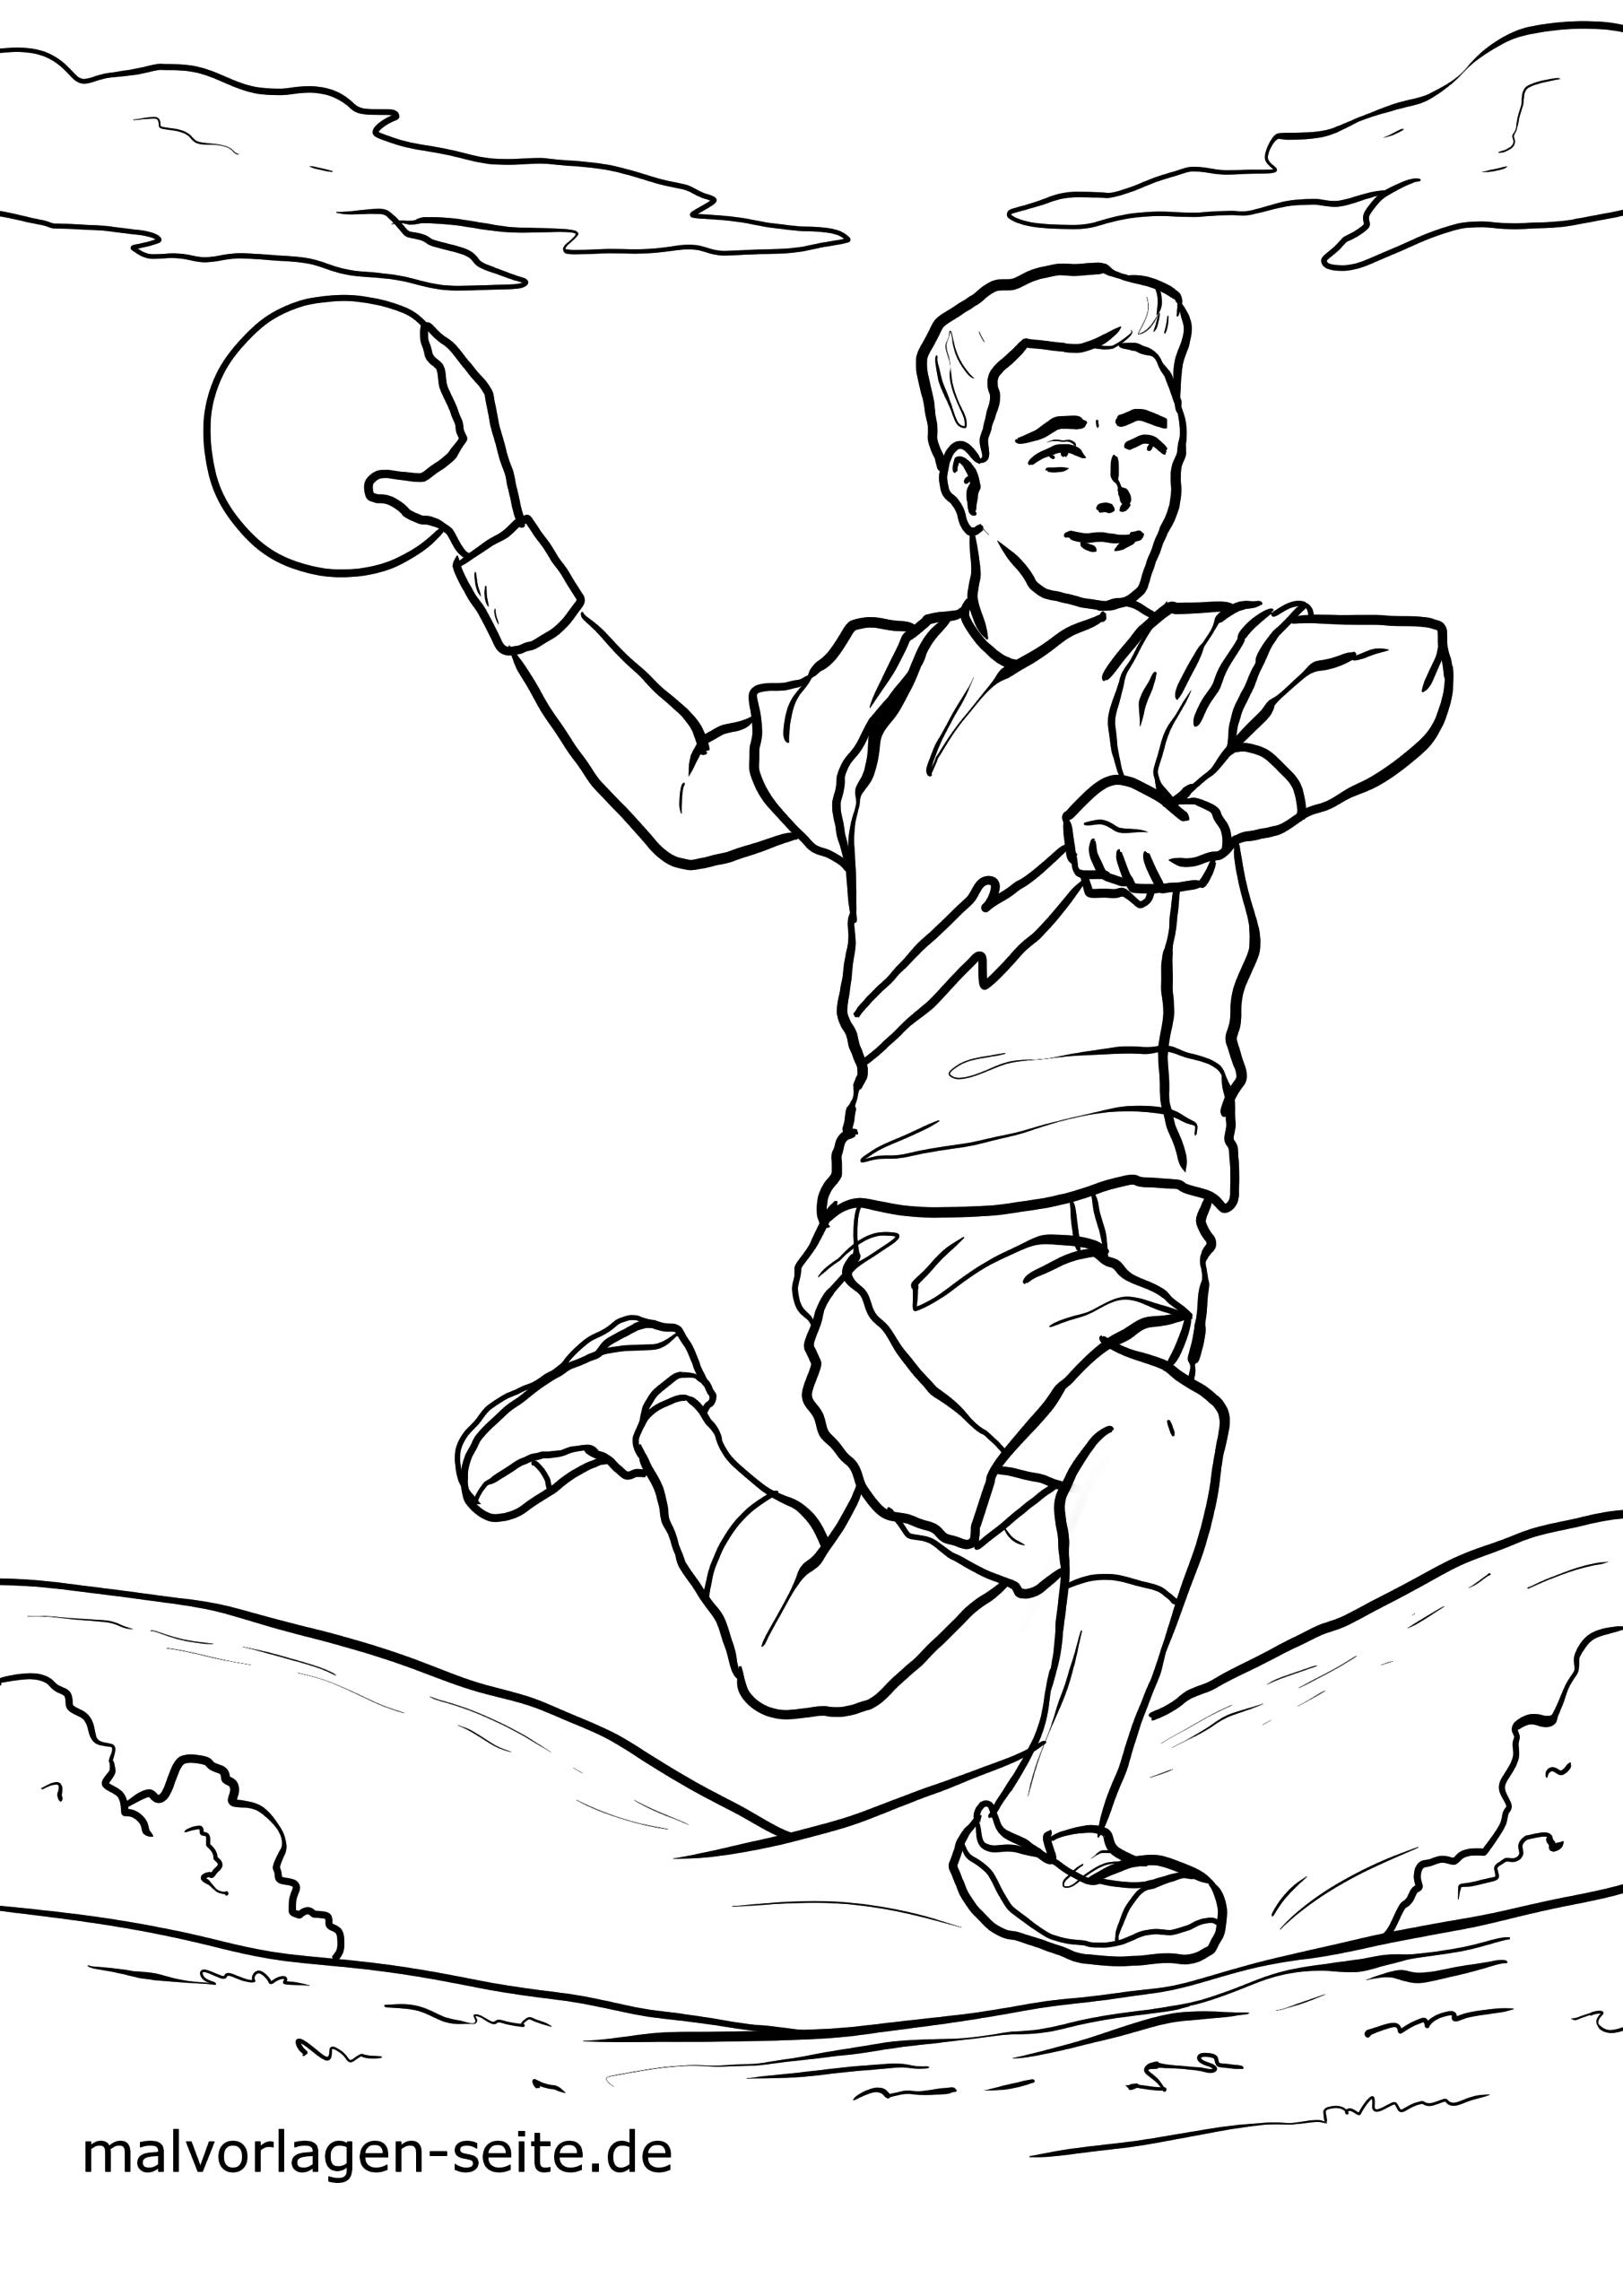 Malvorlage Handball Sport Ausmalbilder Kostenlos